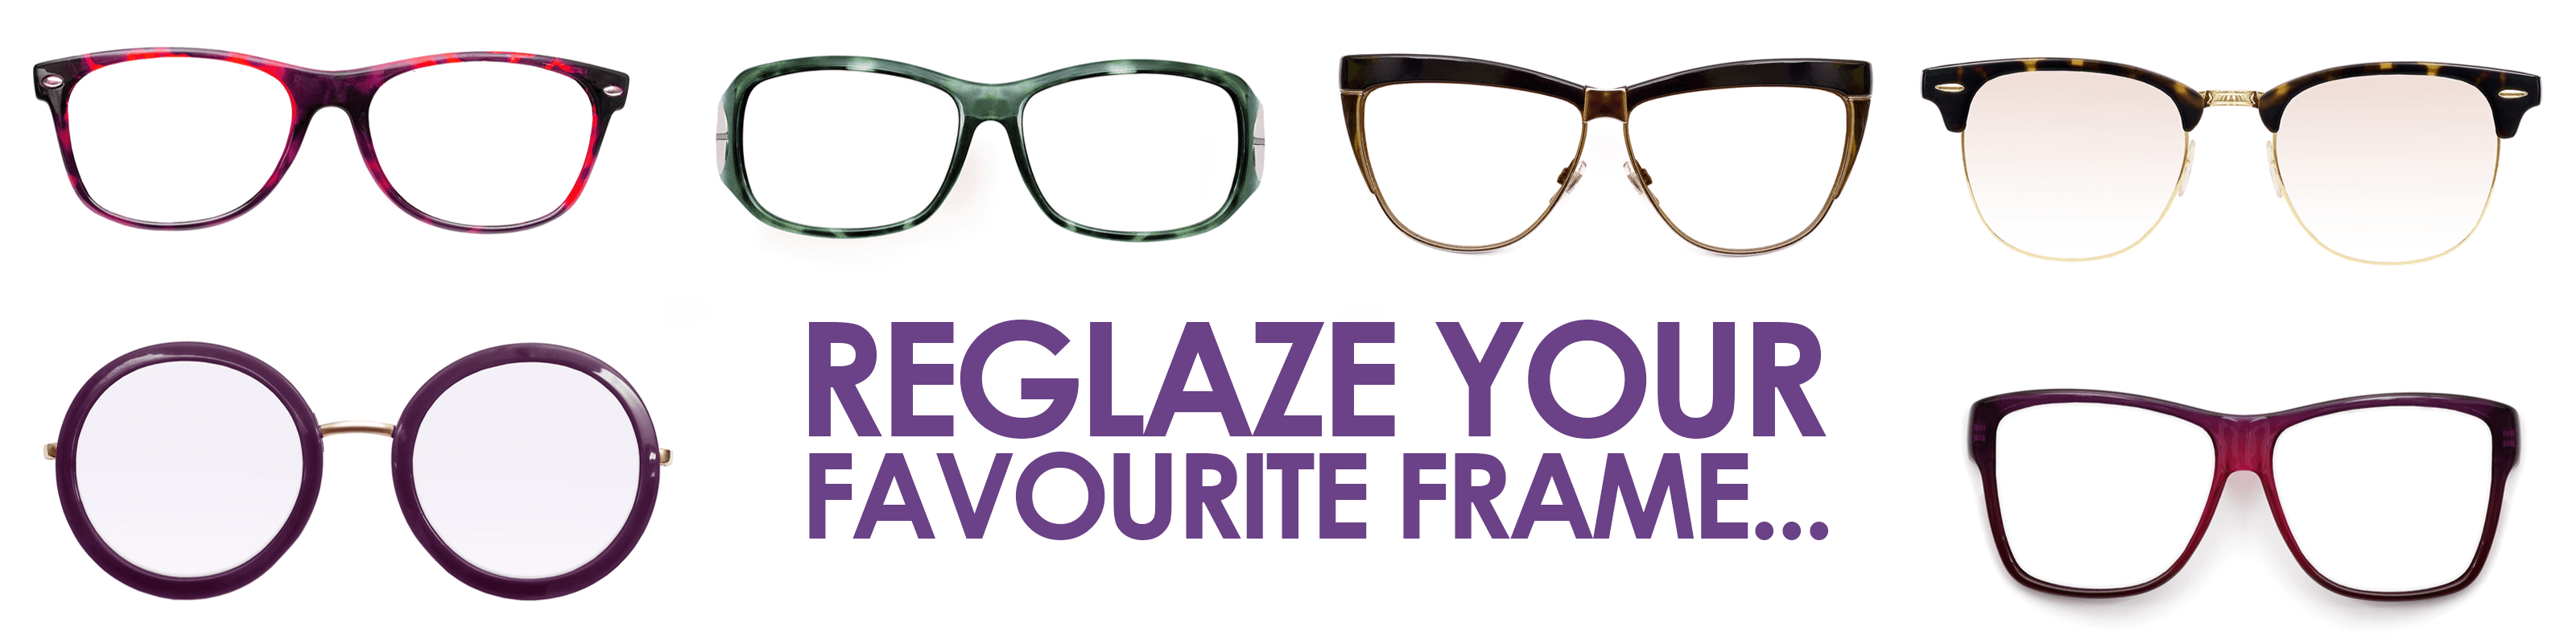 reglazing-banner-blog-online-opticians-uk-upload